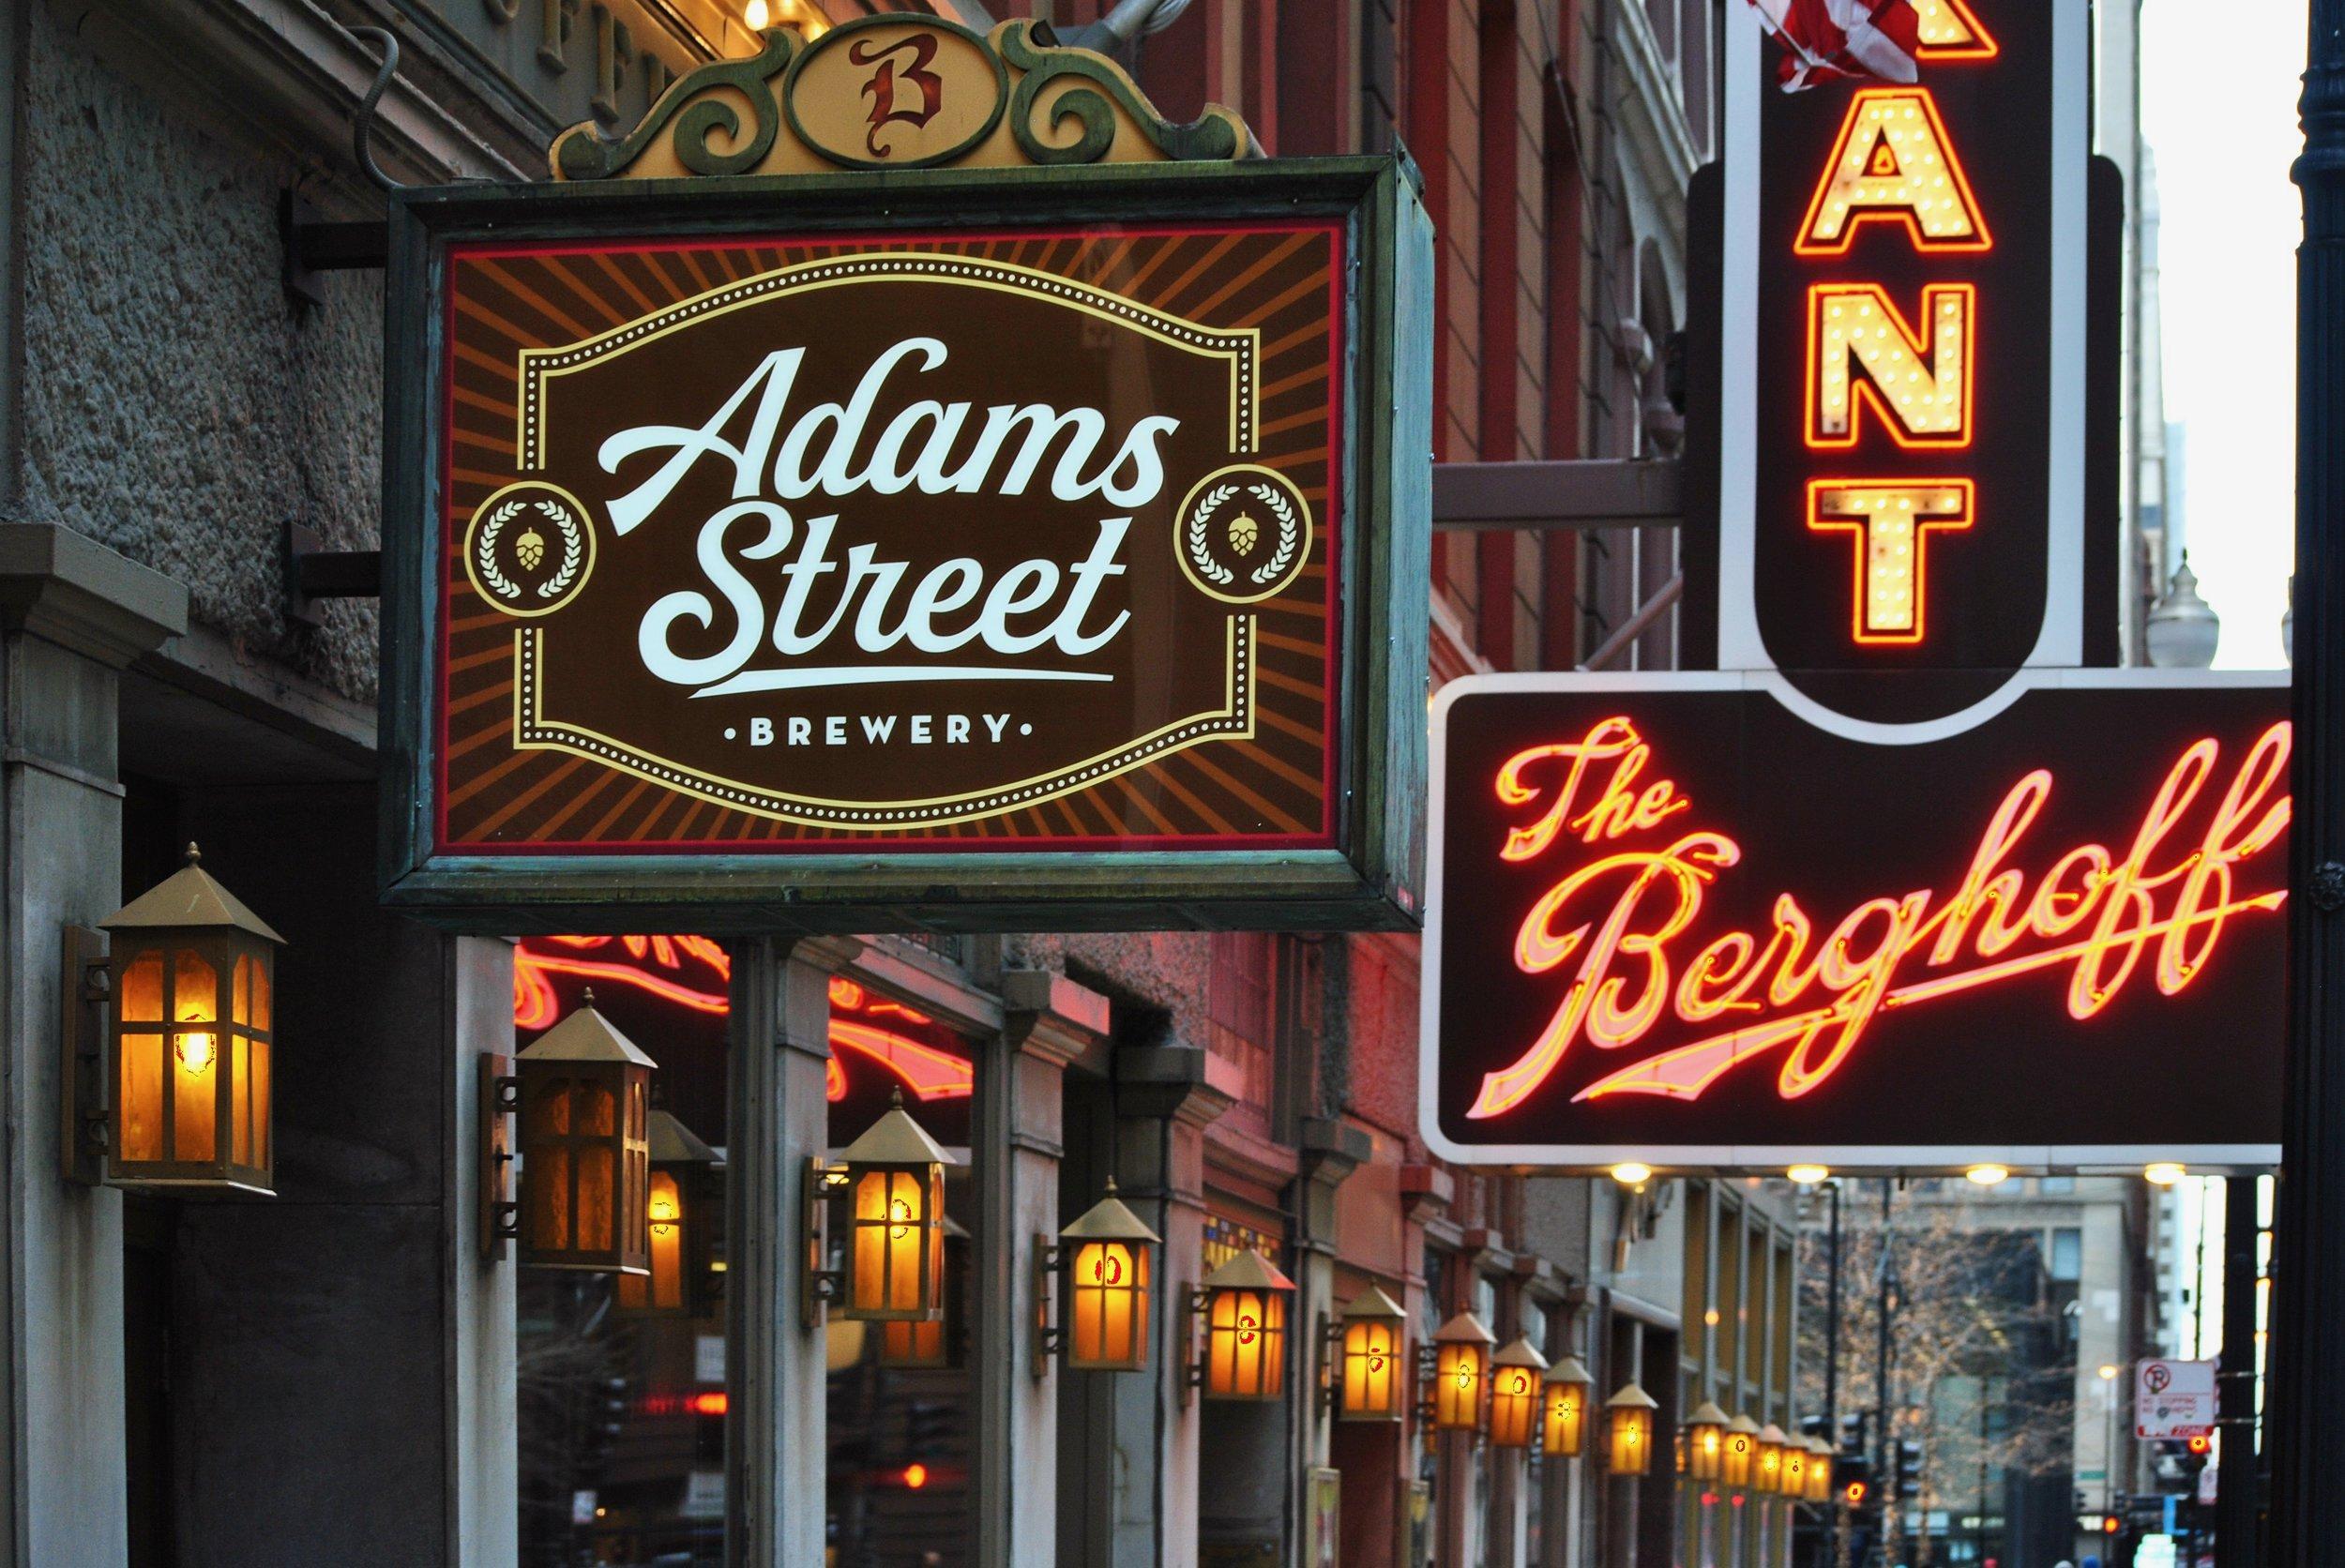 Re-tapped: Adams Street Brewery